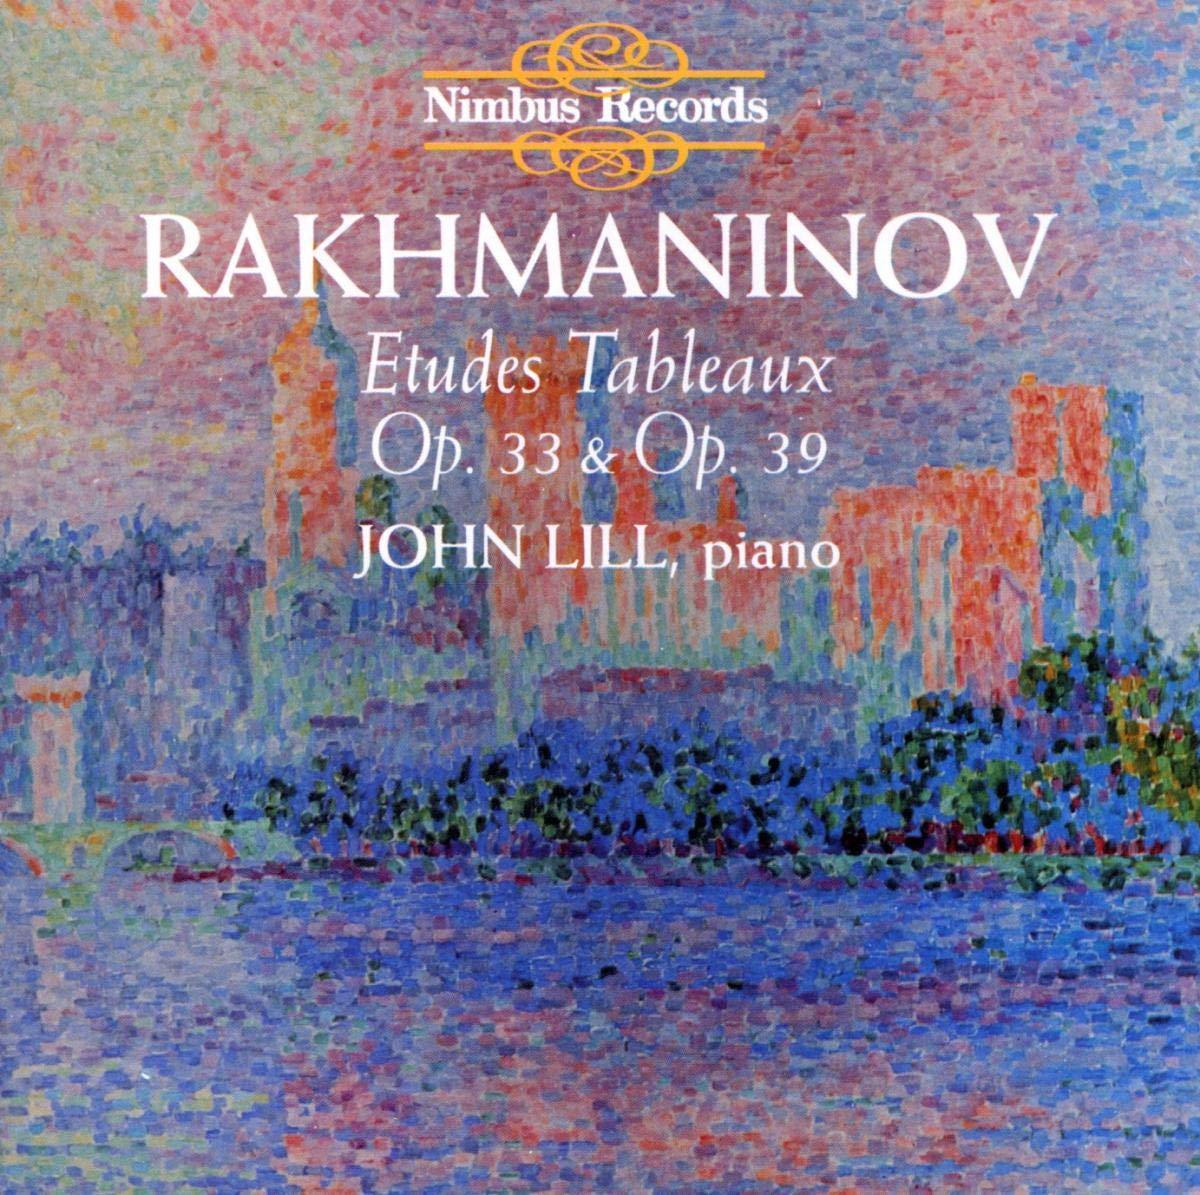 Rakhmaninov: Etudes-Tableaux Op. 33 Factory outlet Gifts 39